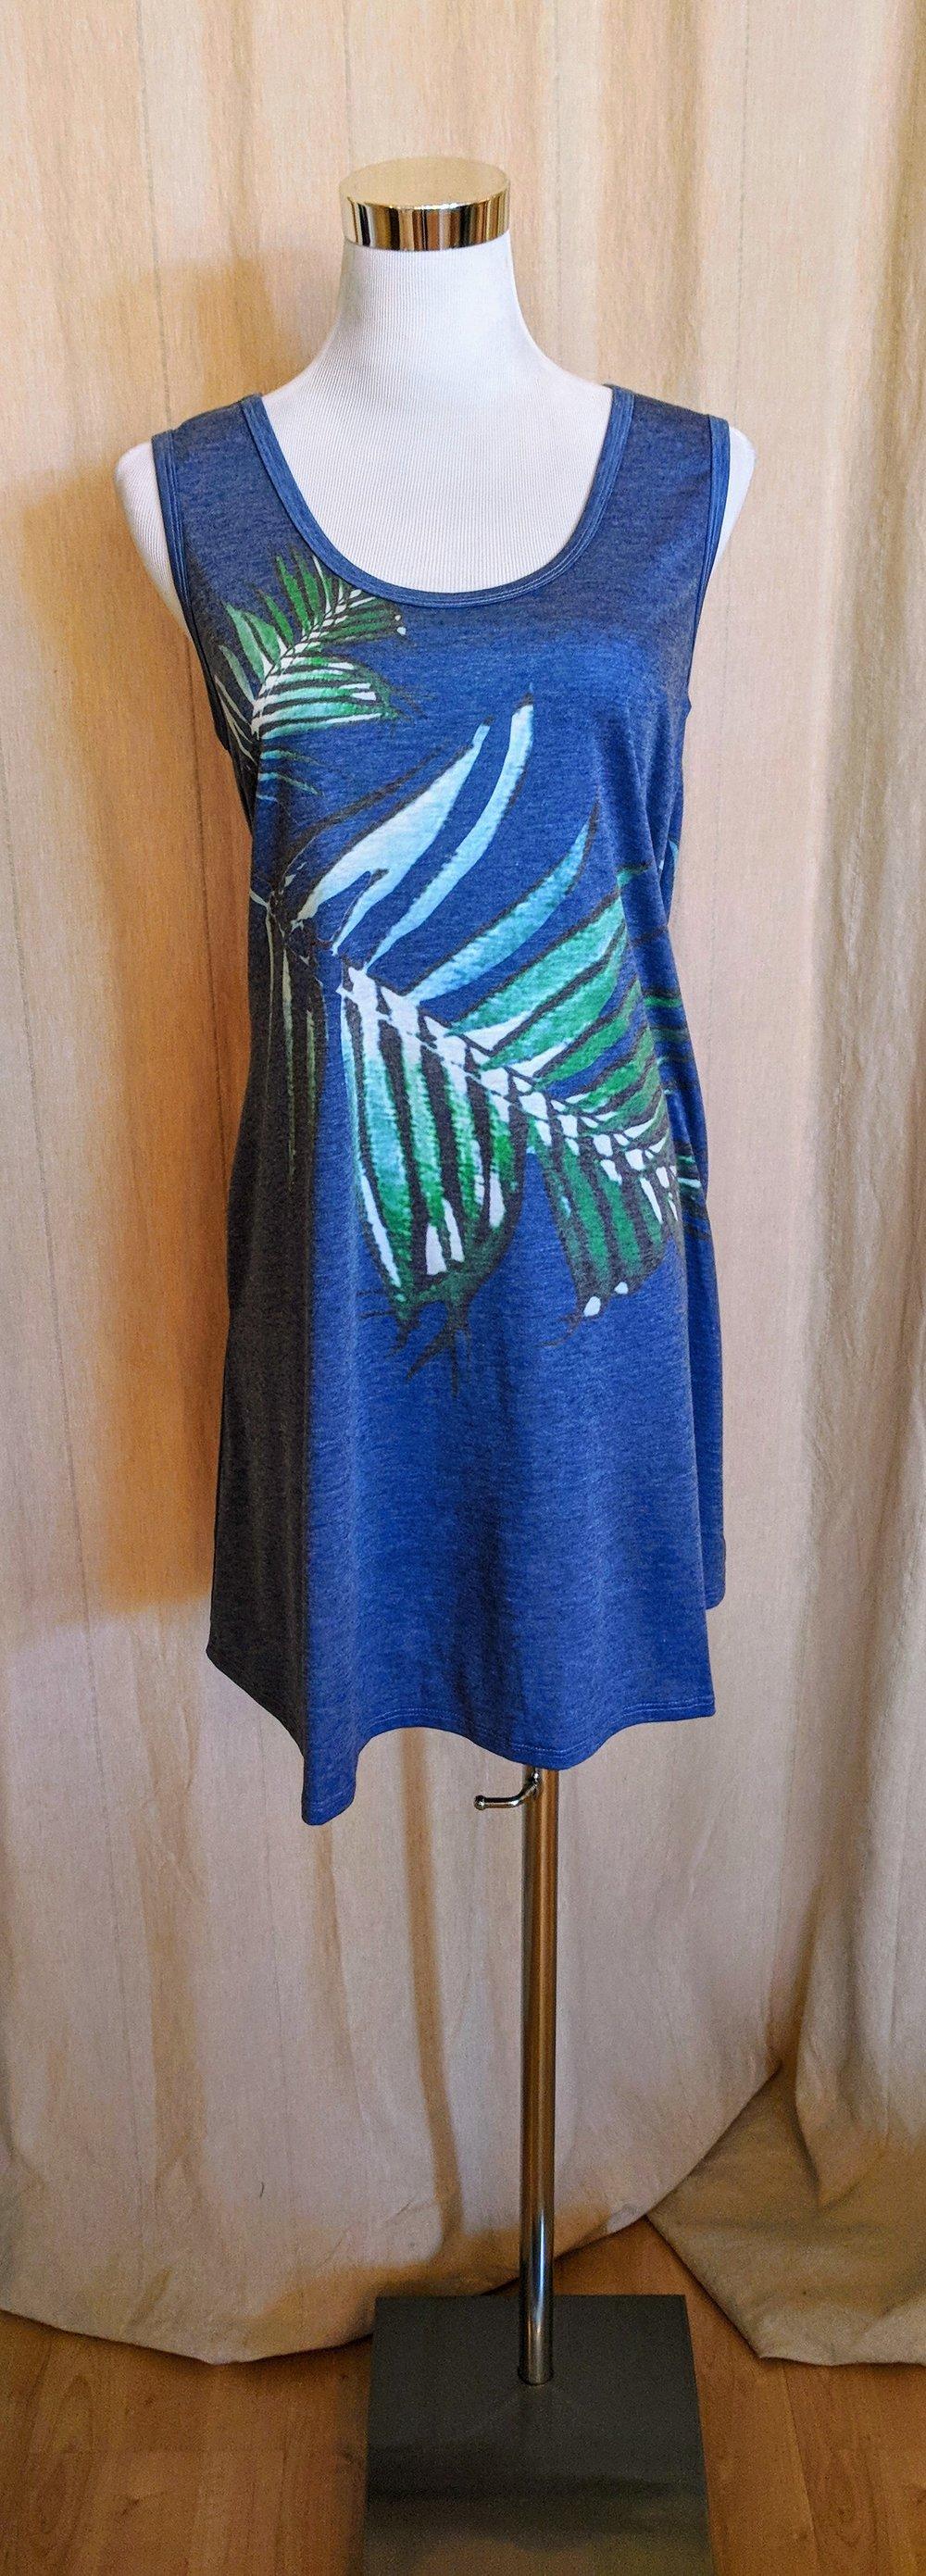 Tropical Print tank dress $32